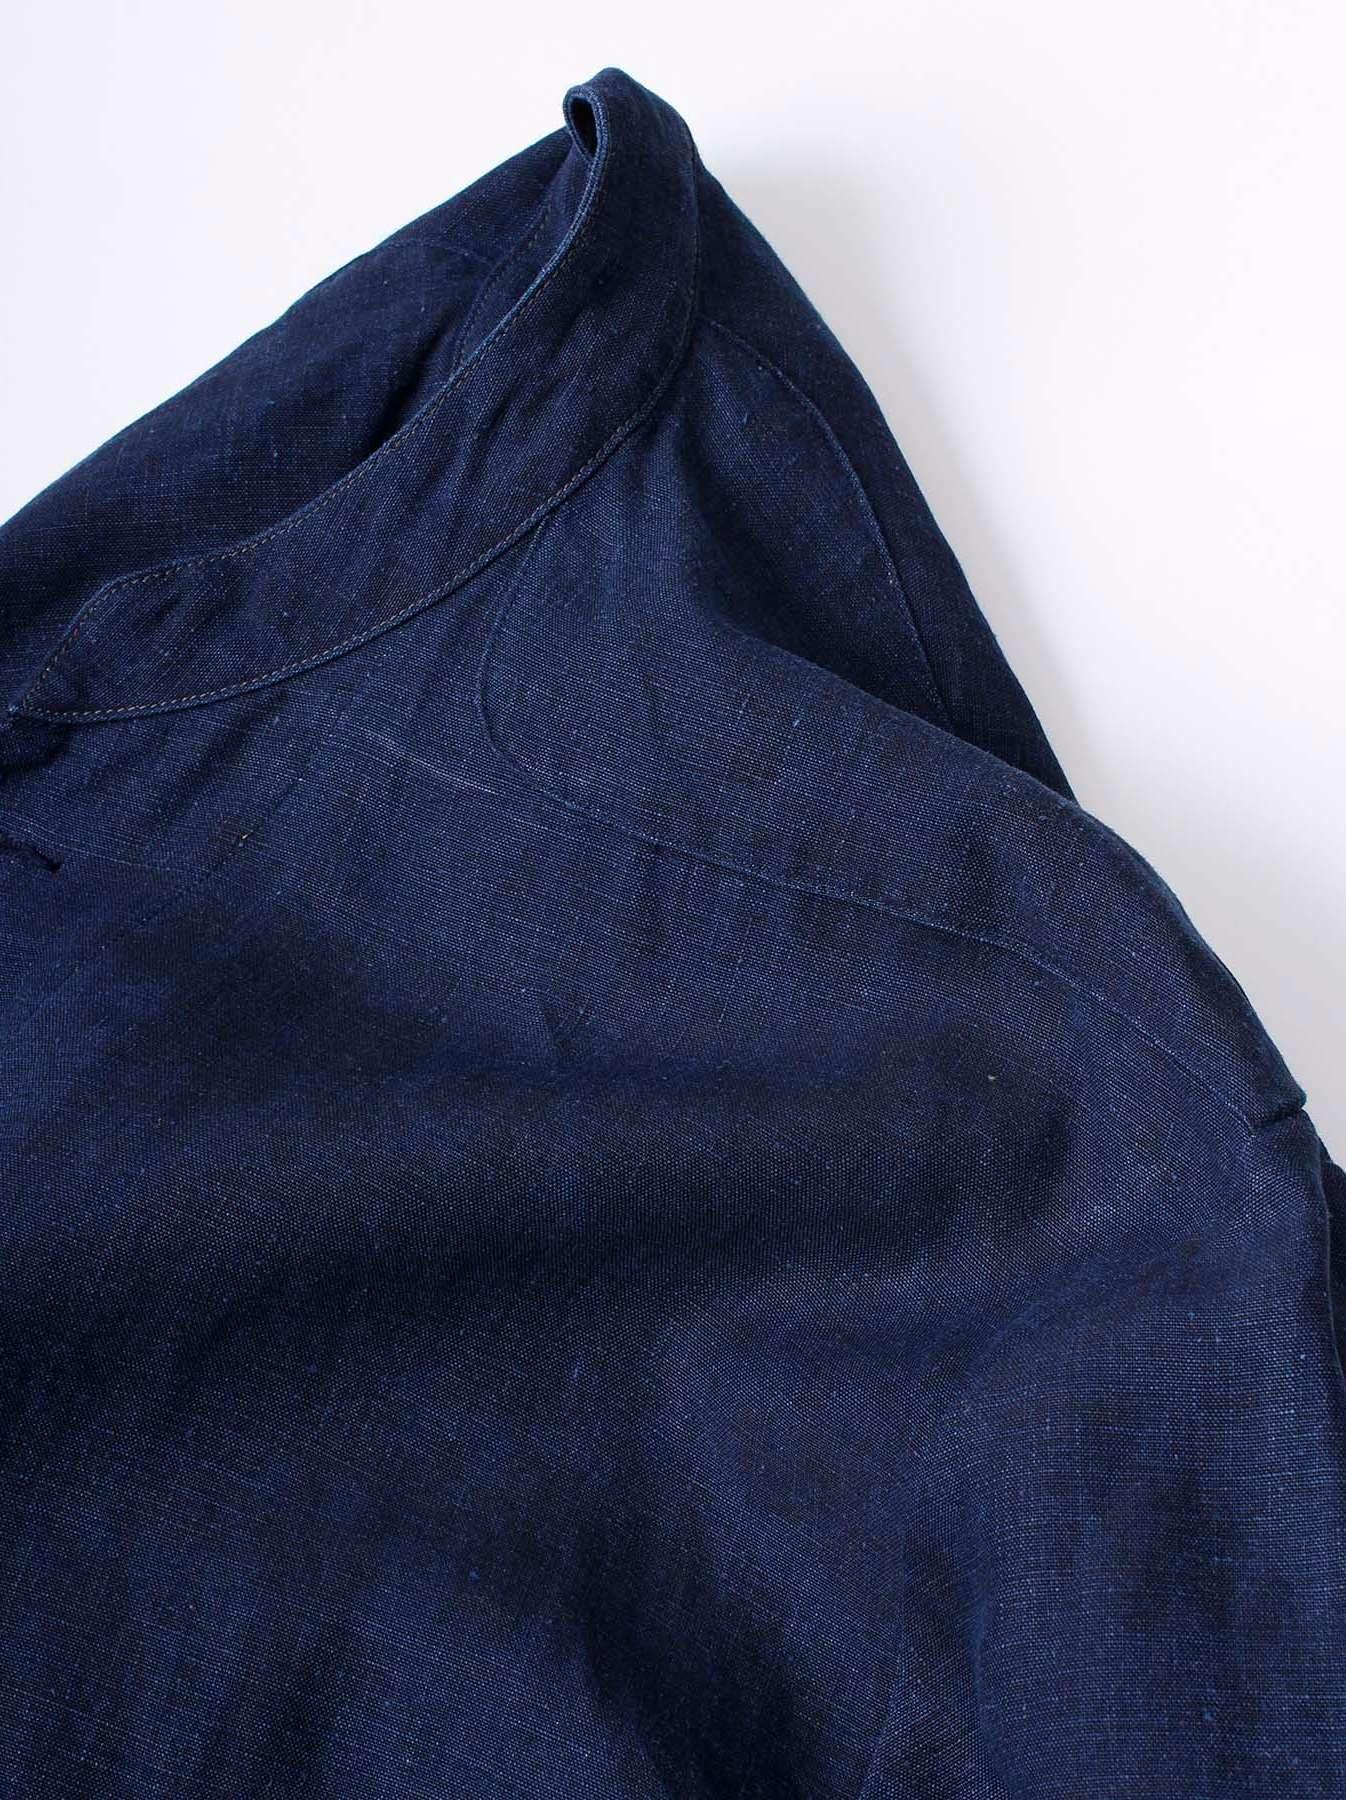 WH Indigo Linen Stand Collar Jacket-8